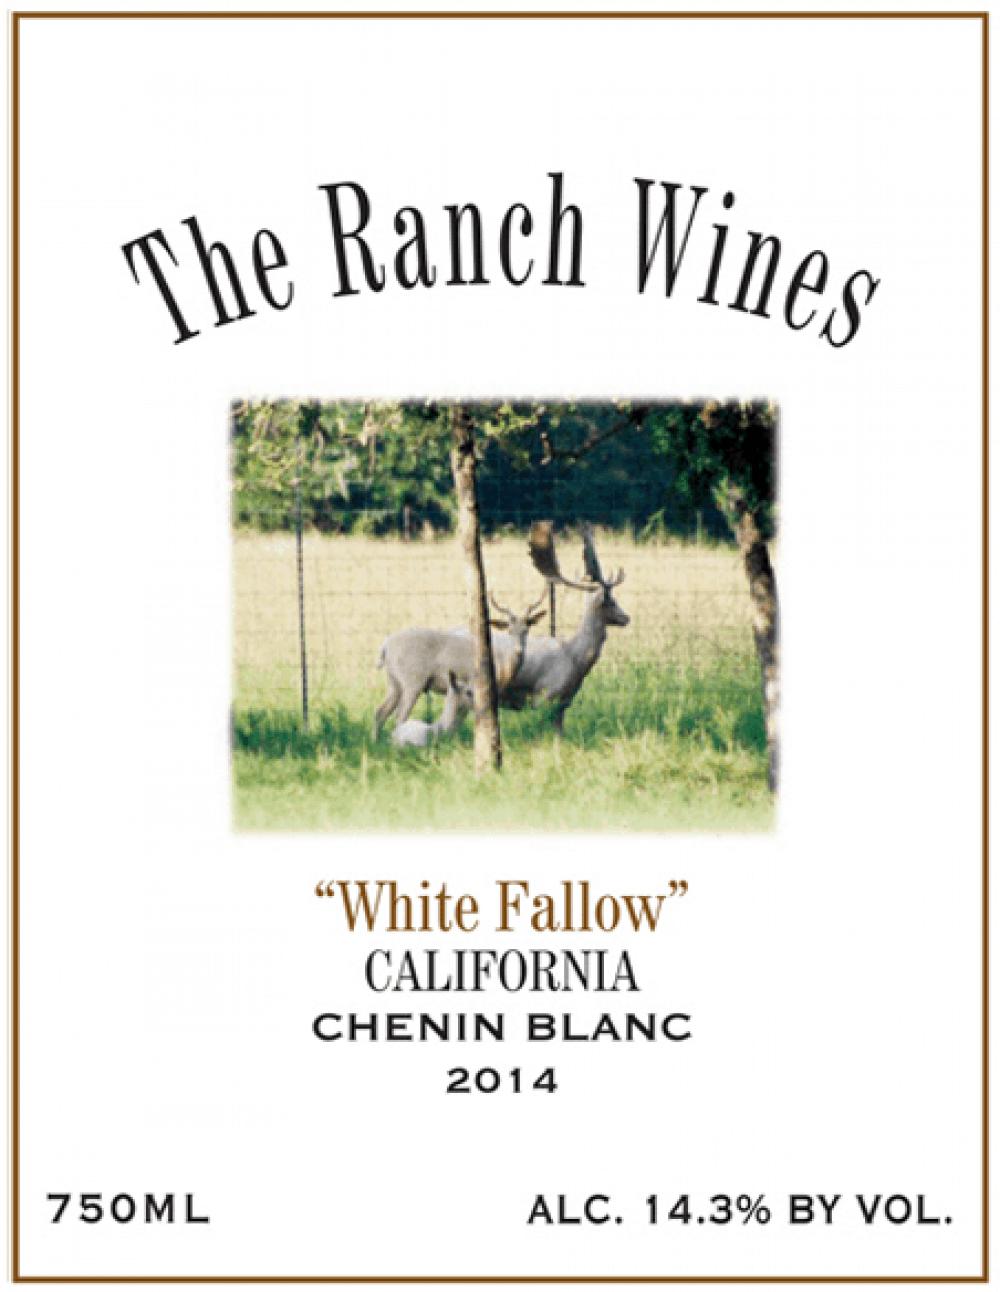 California Chenin Blanc White Fallow